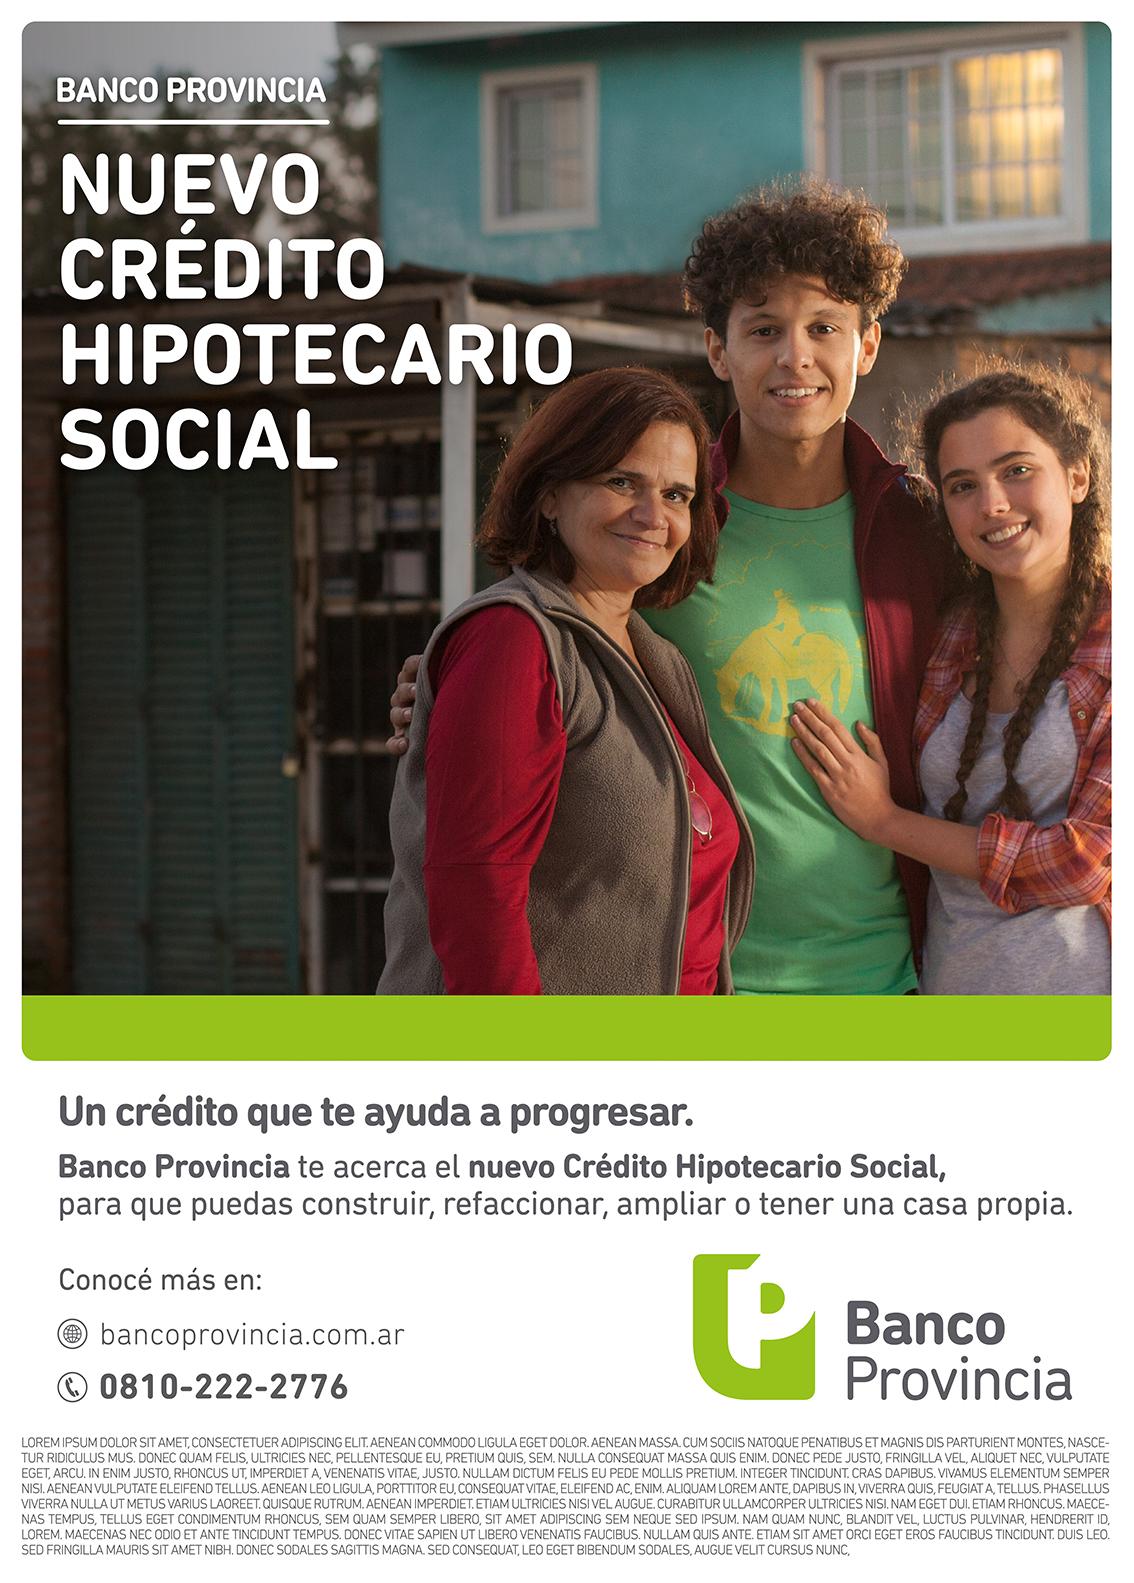 04 Bapro Graficas NCHS 2-02.jpg